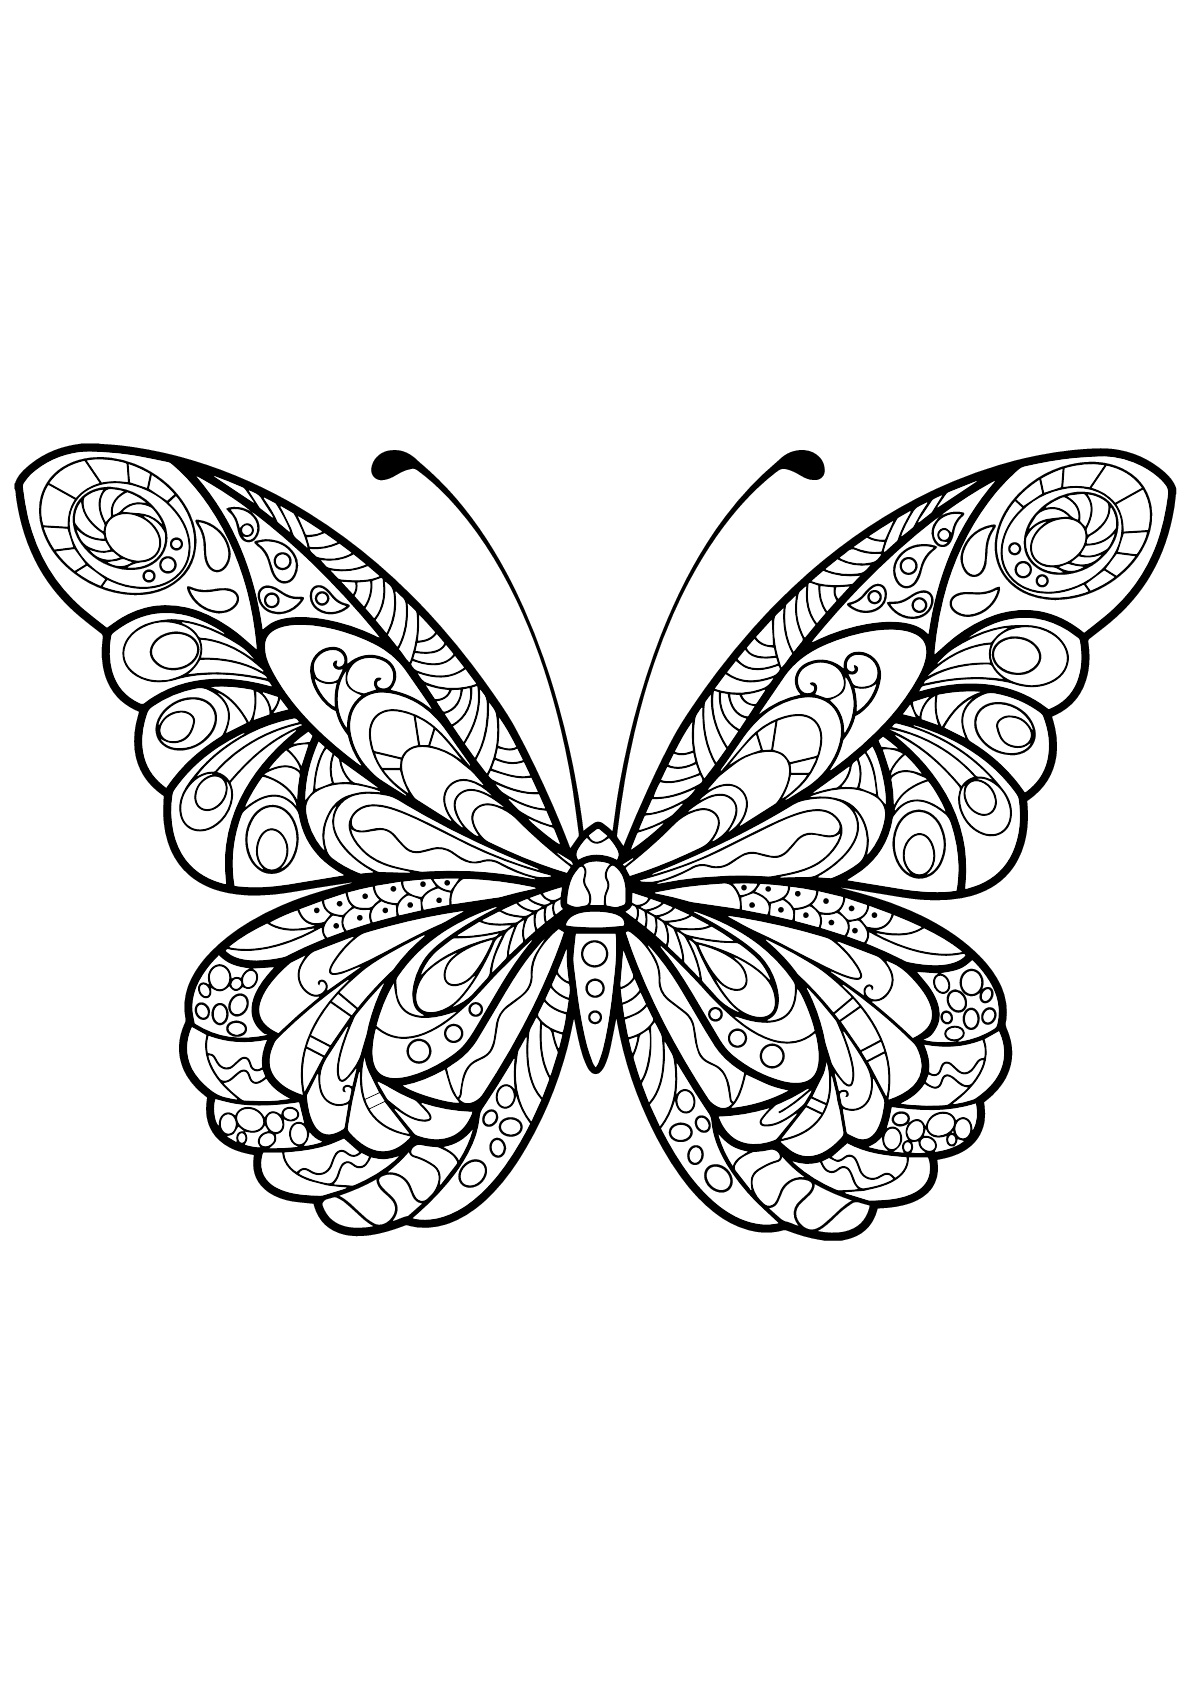 Butterflies for children - Butterflies Kids Coloring Pages